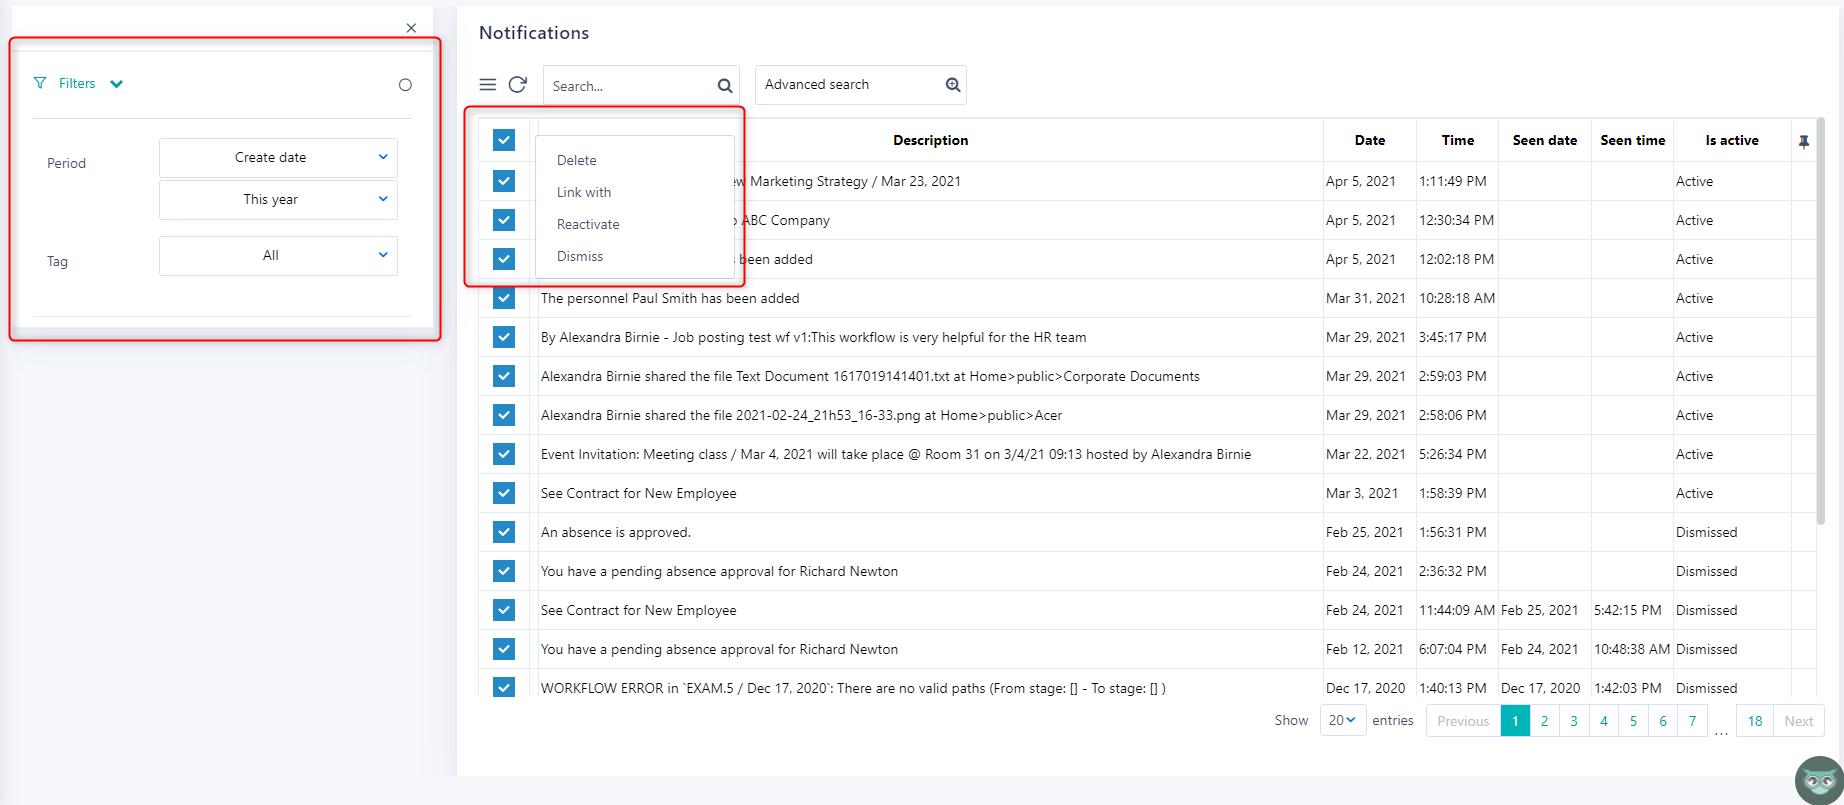 Previous notifications v.6| Comidor Platform